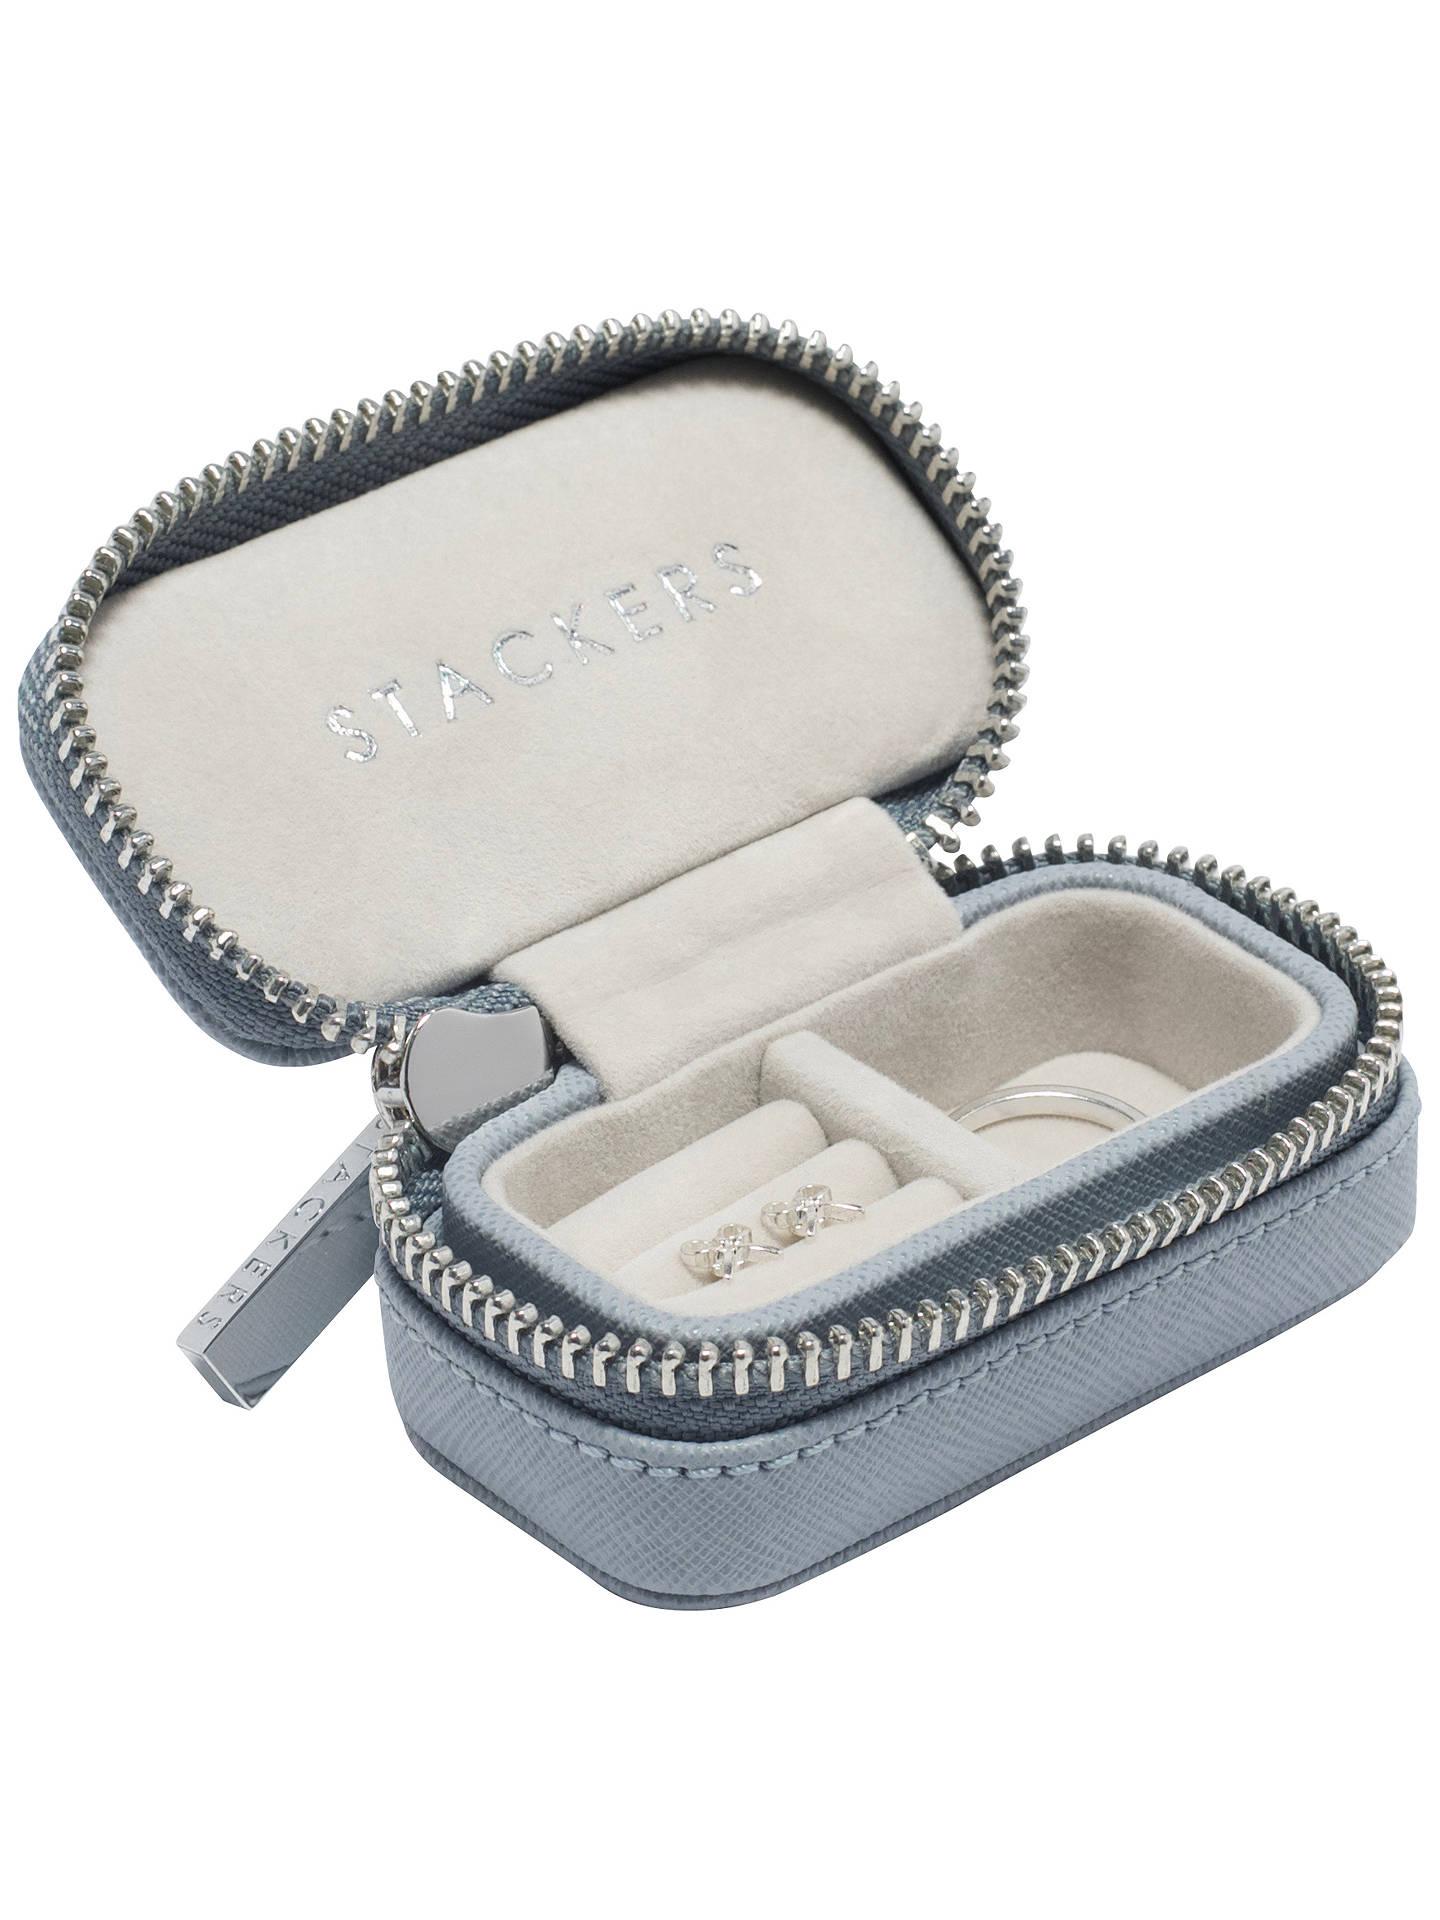 Stackers Petite Travel Jewellery Box Dusky Blue